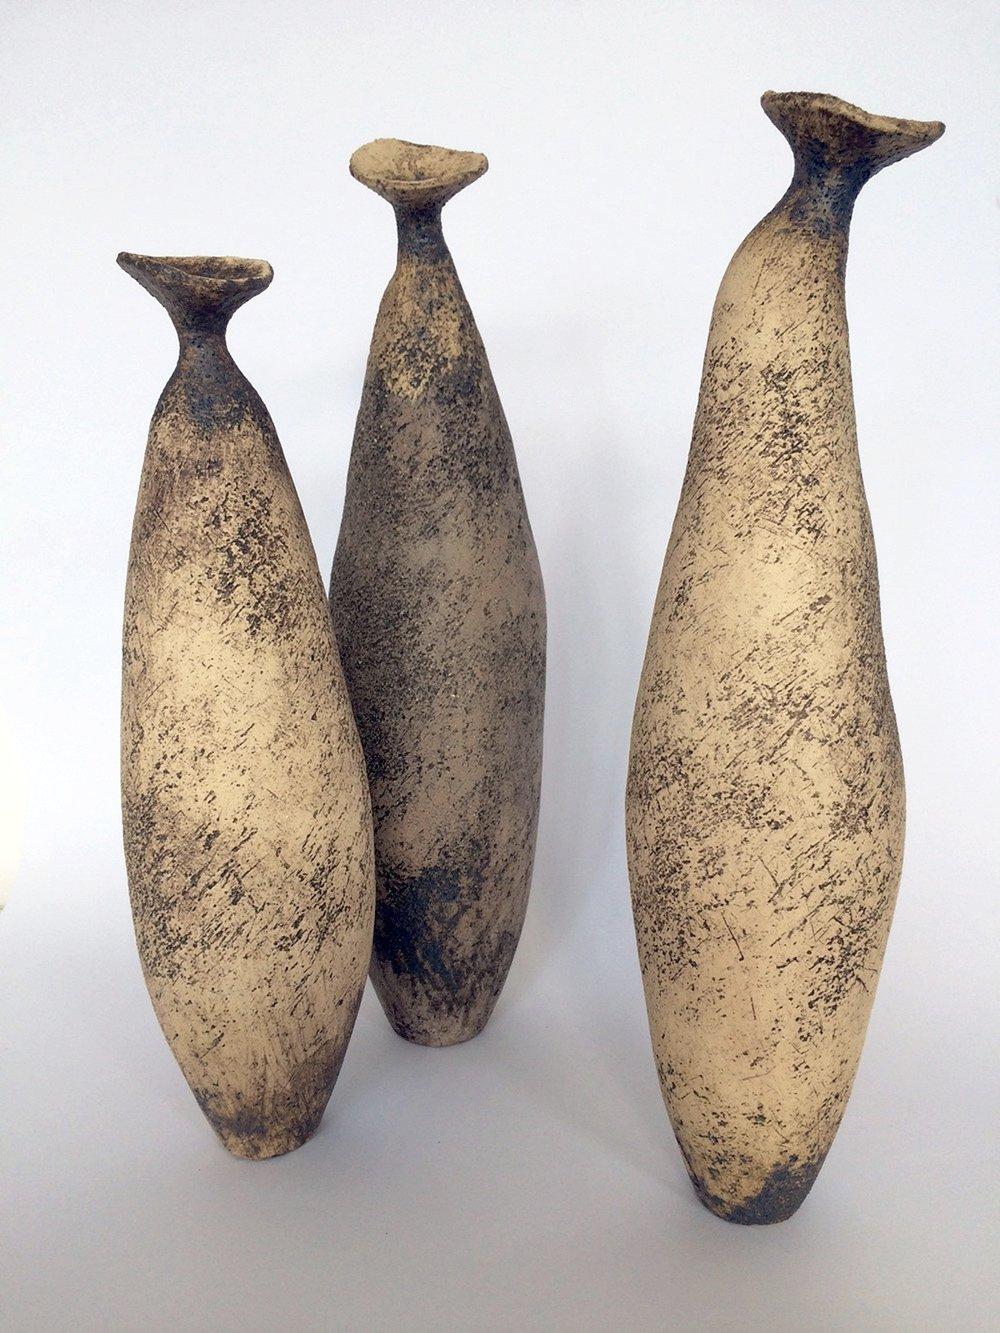 Image 2 stoneware vessels Julie O'Sullivan.jpg